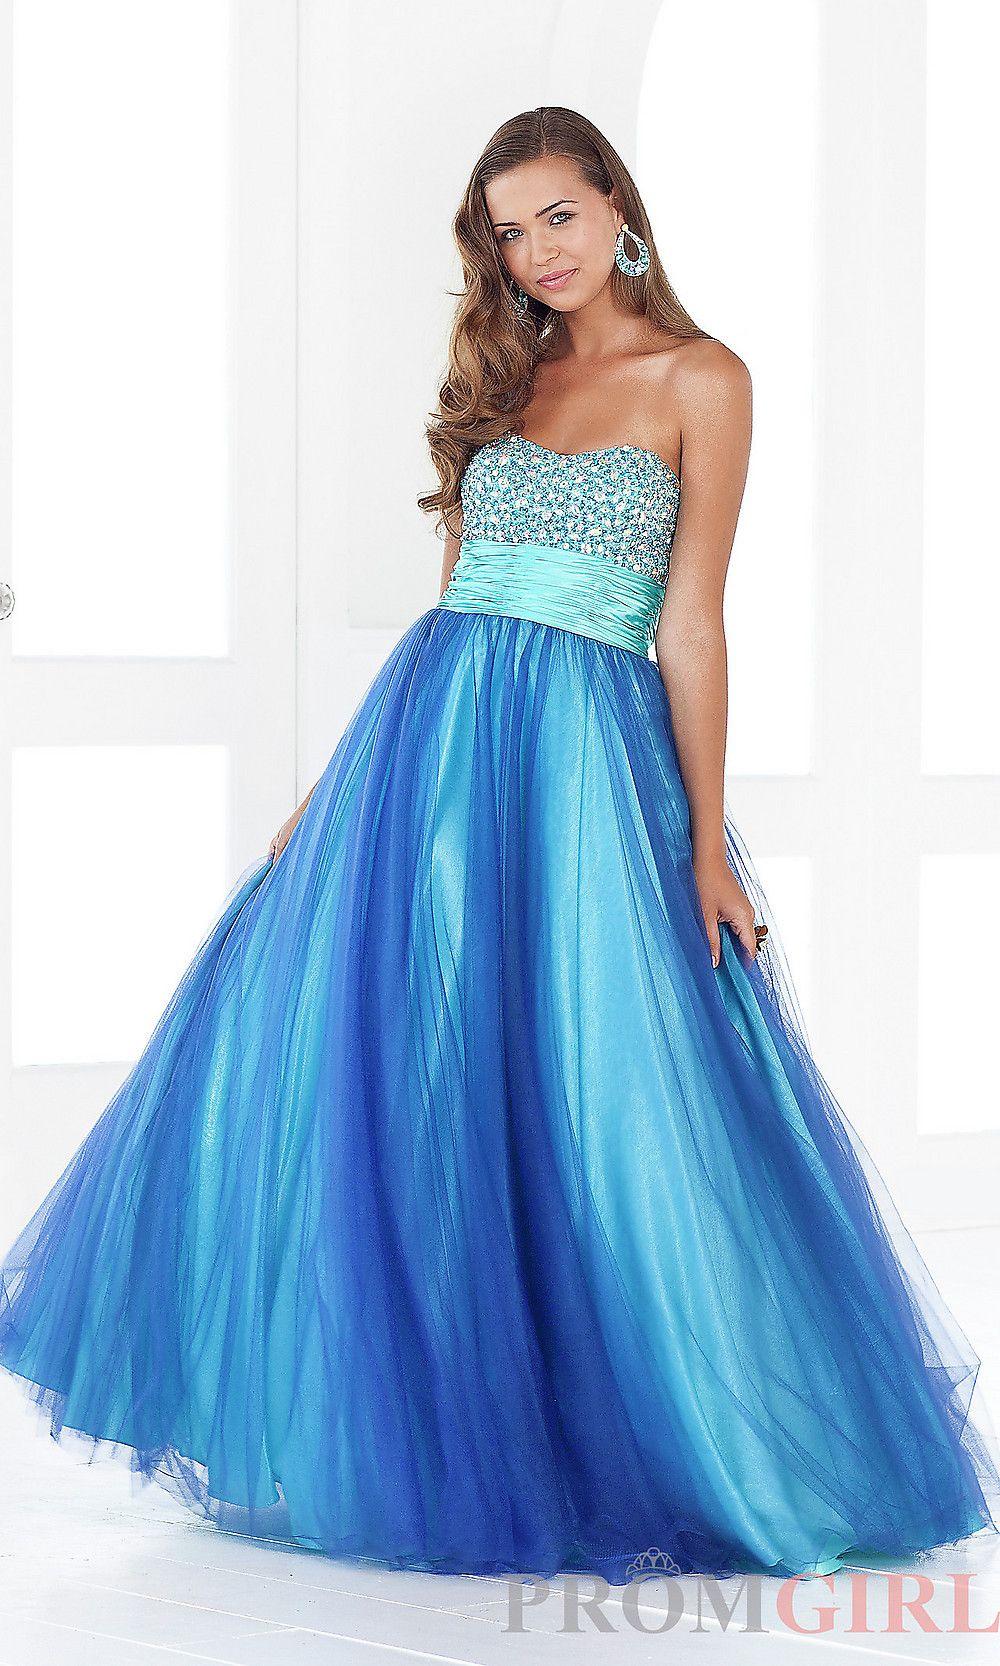 Blush promgirl dresses pinterest ball gowns